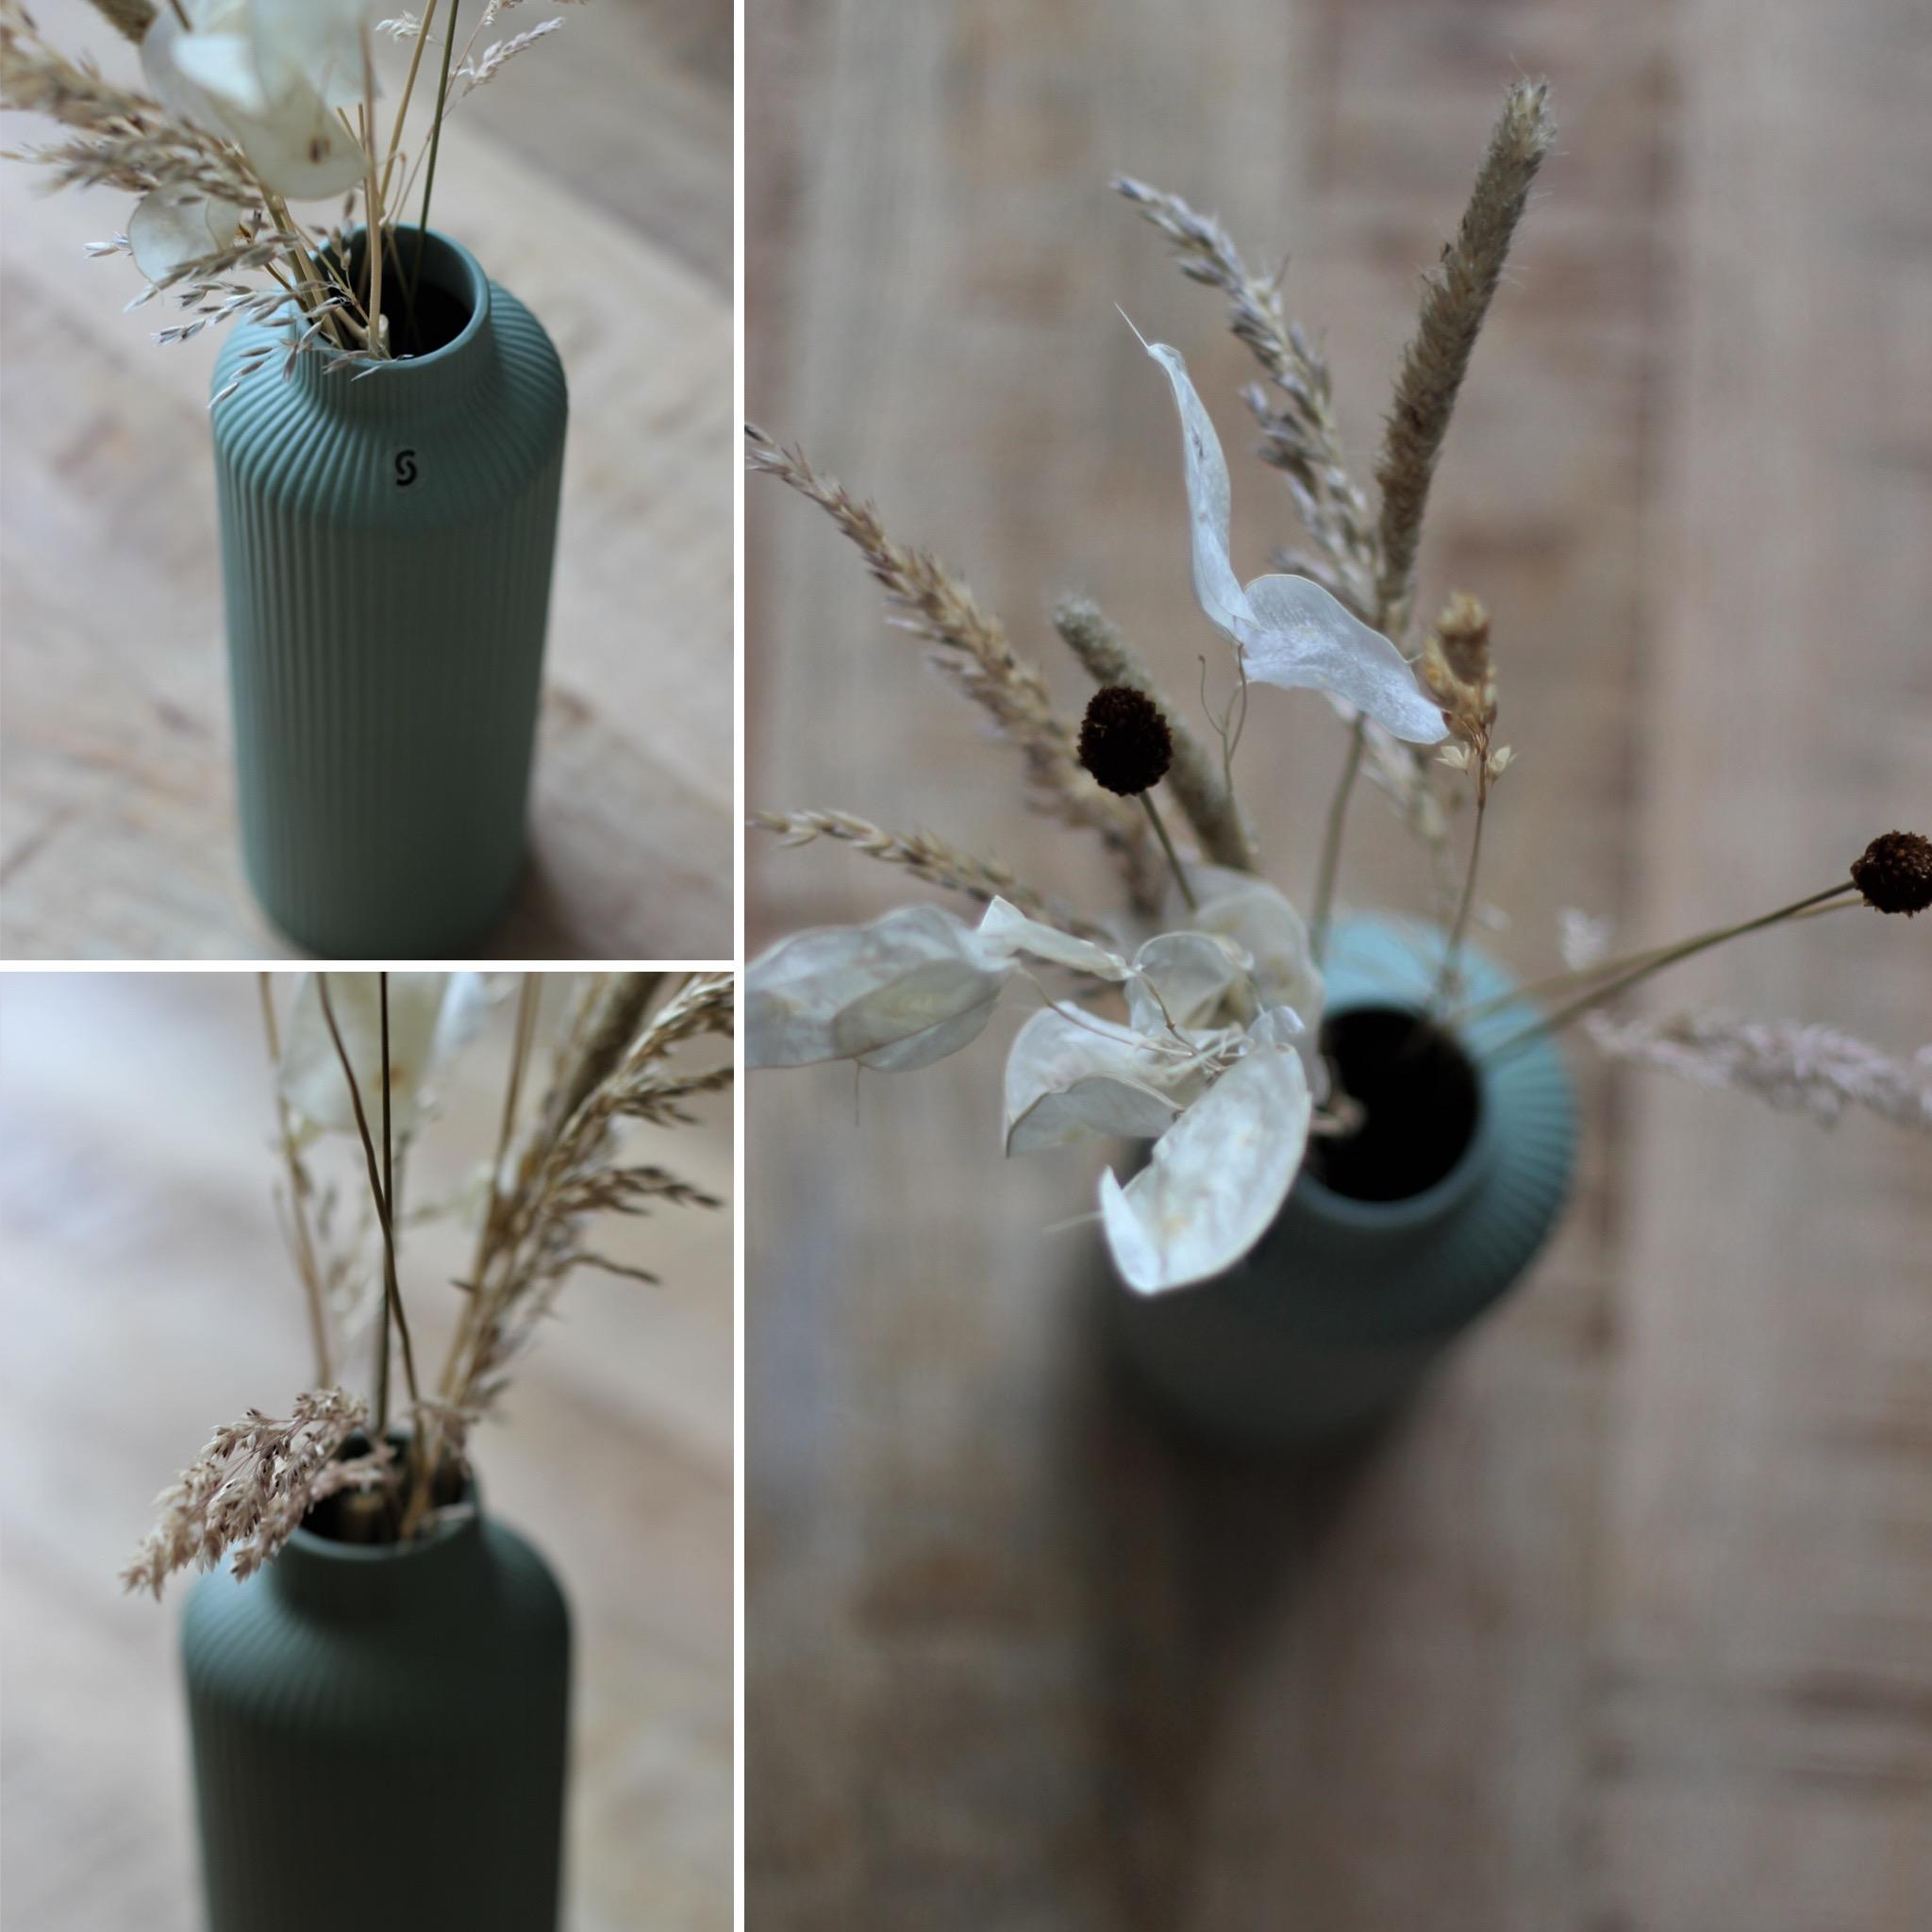 Nützlichdekoration - ÅDALA Vase Grün 23cm Storefactory - Onlineshop Tante Emmer